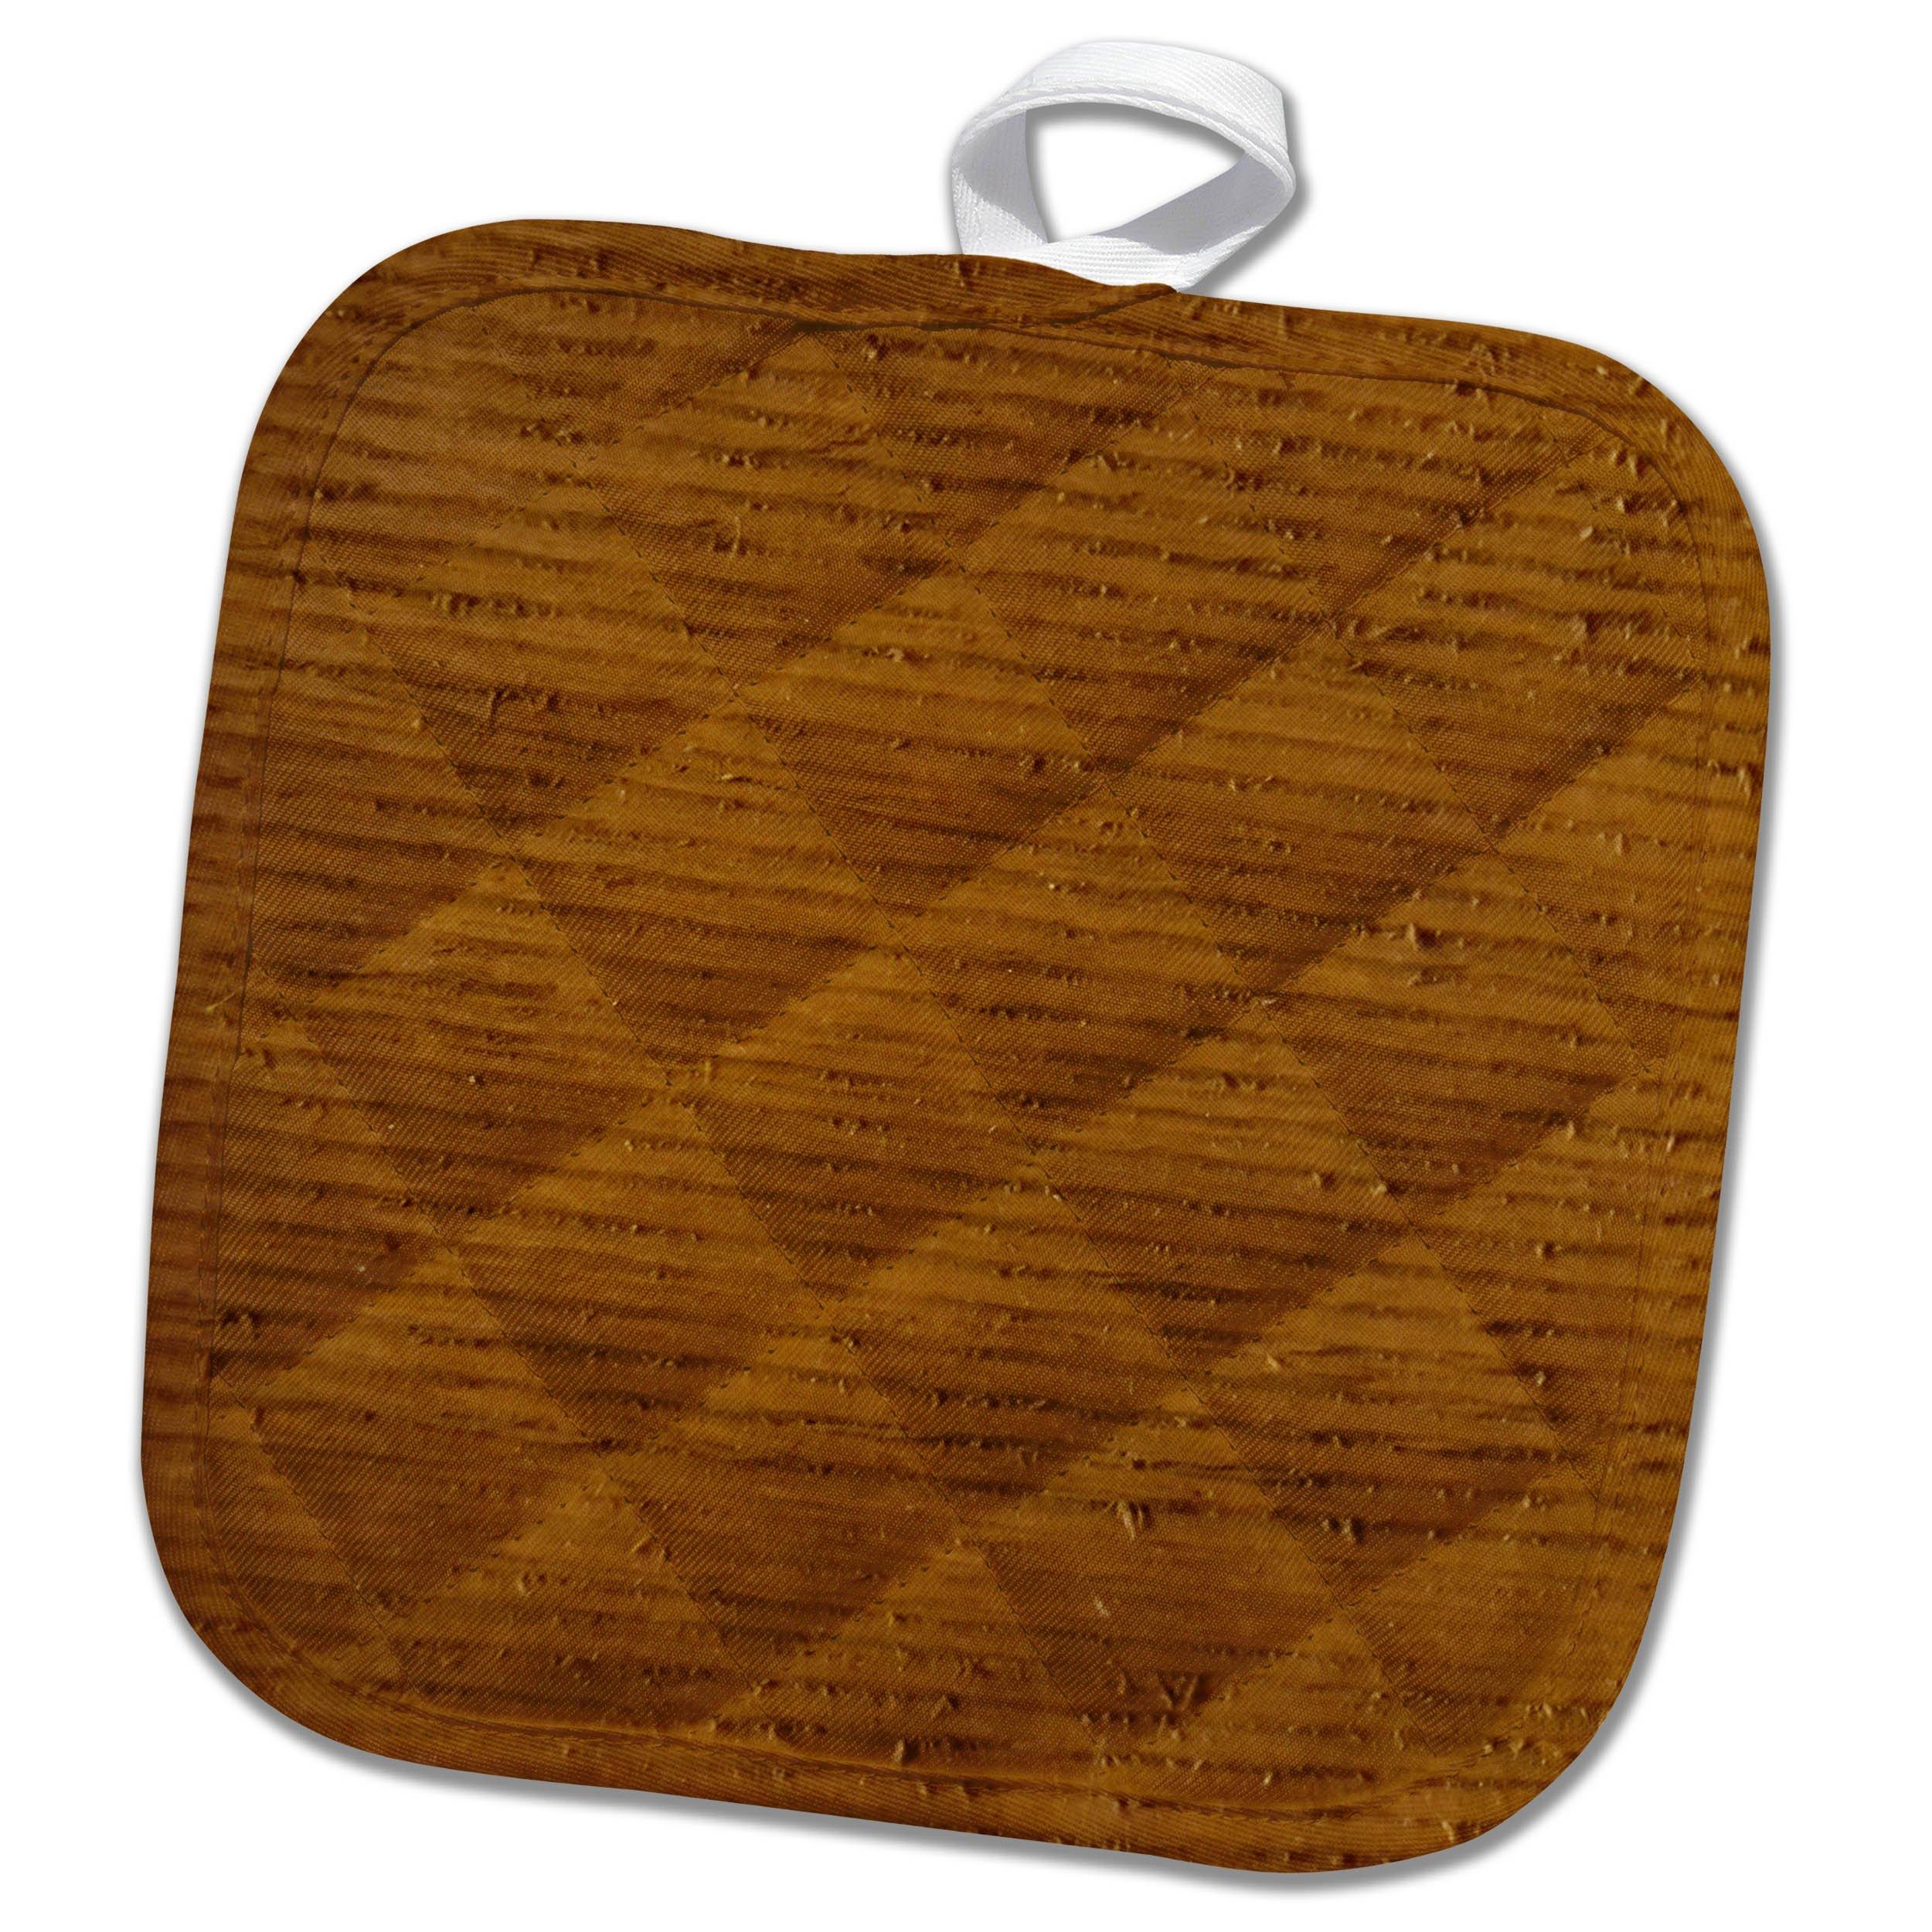 3dRose TDSwhite – Miscellaneous Photography - Dry Wood Grains - 8x8 Potholder (phl_285291_1)